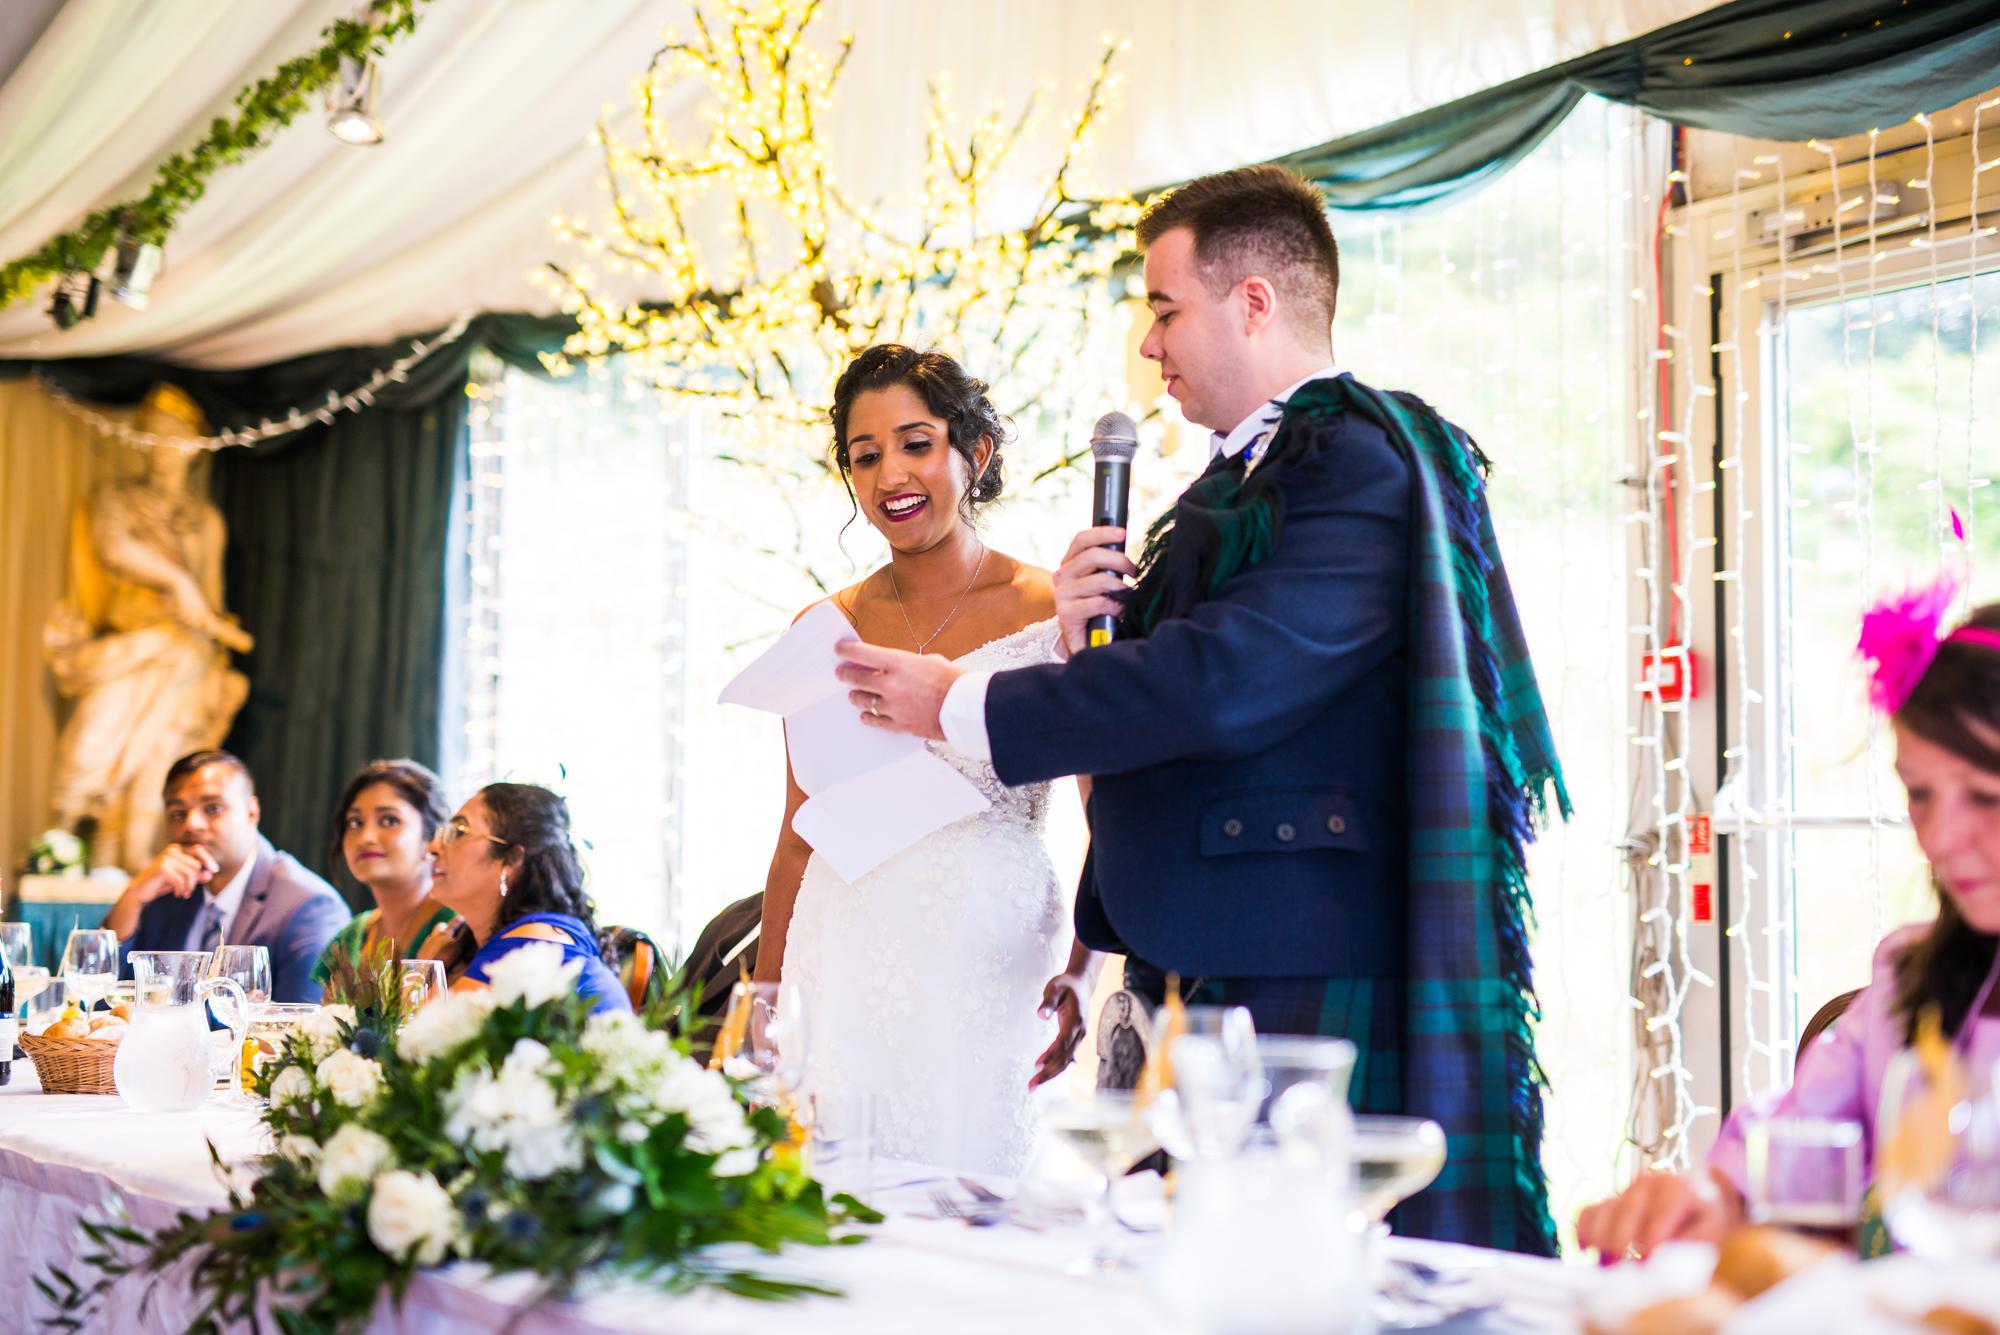 Kev and Shrabani wedding photos (253 of 350).jpg